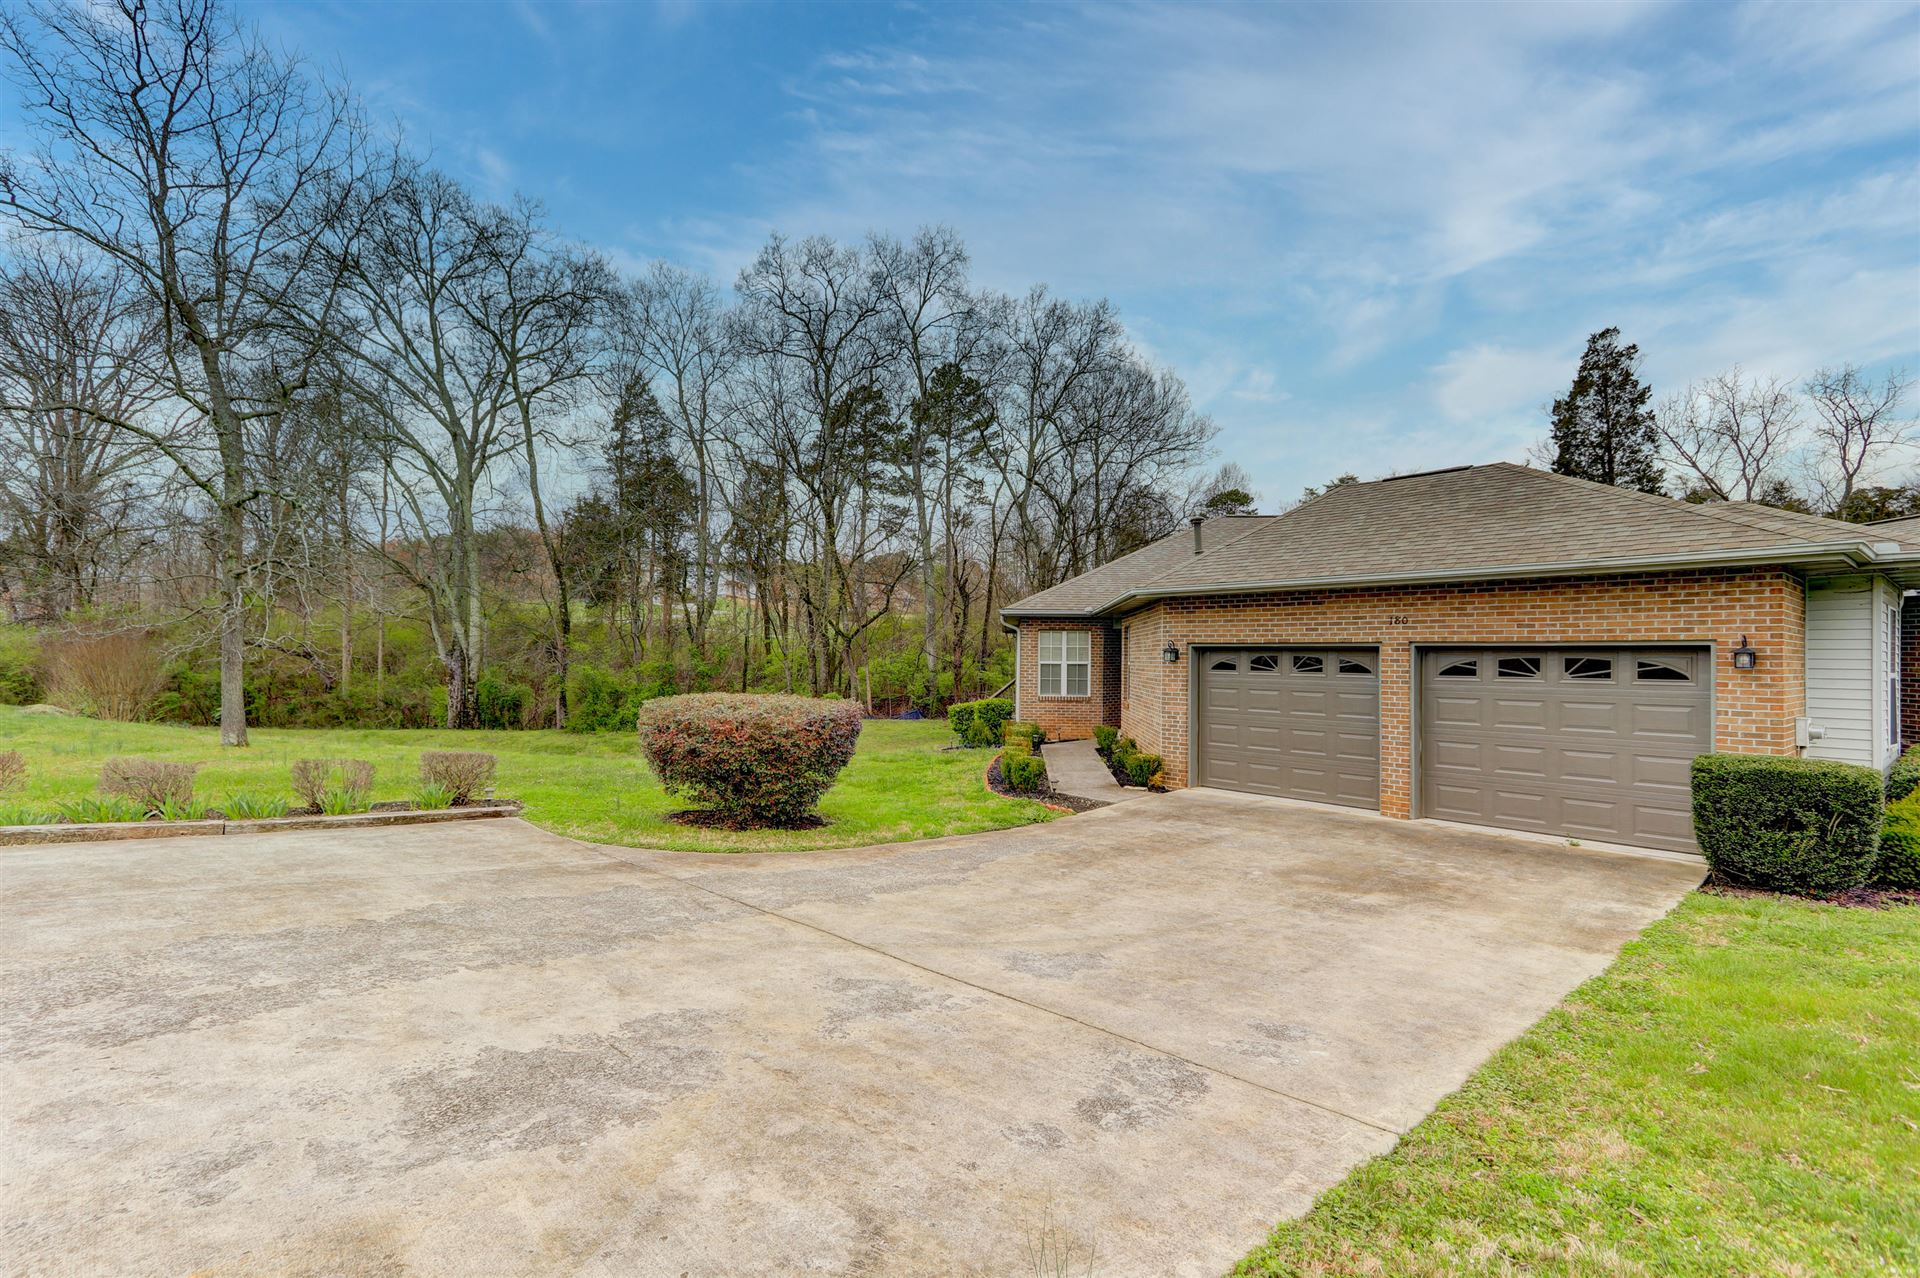 Photo of 180 Hidden Oaks Lane, Lenoir City, TN 37772 (MLS # 1112572)